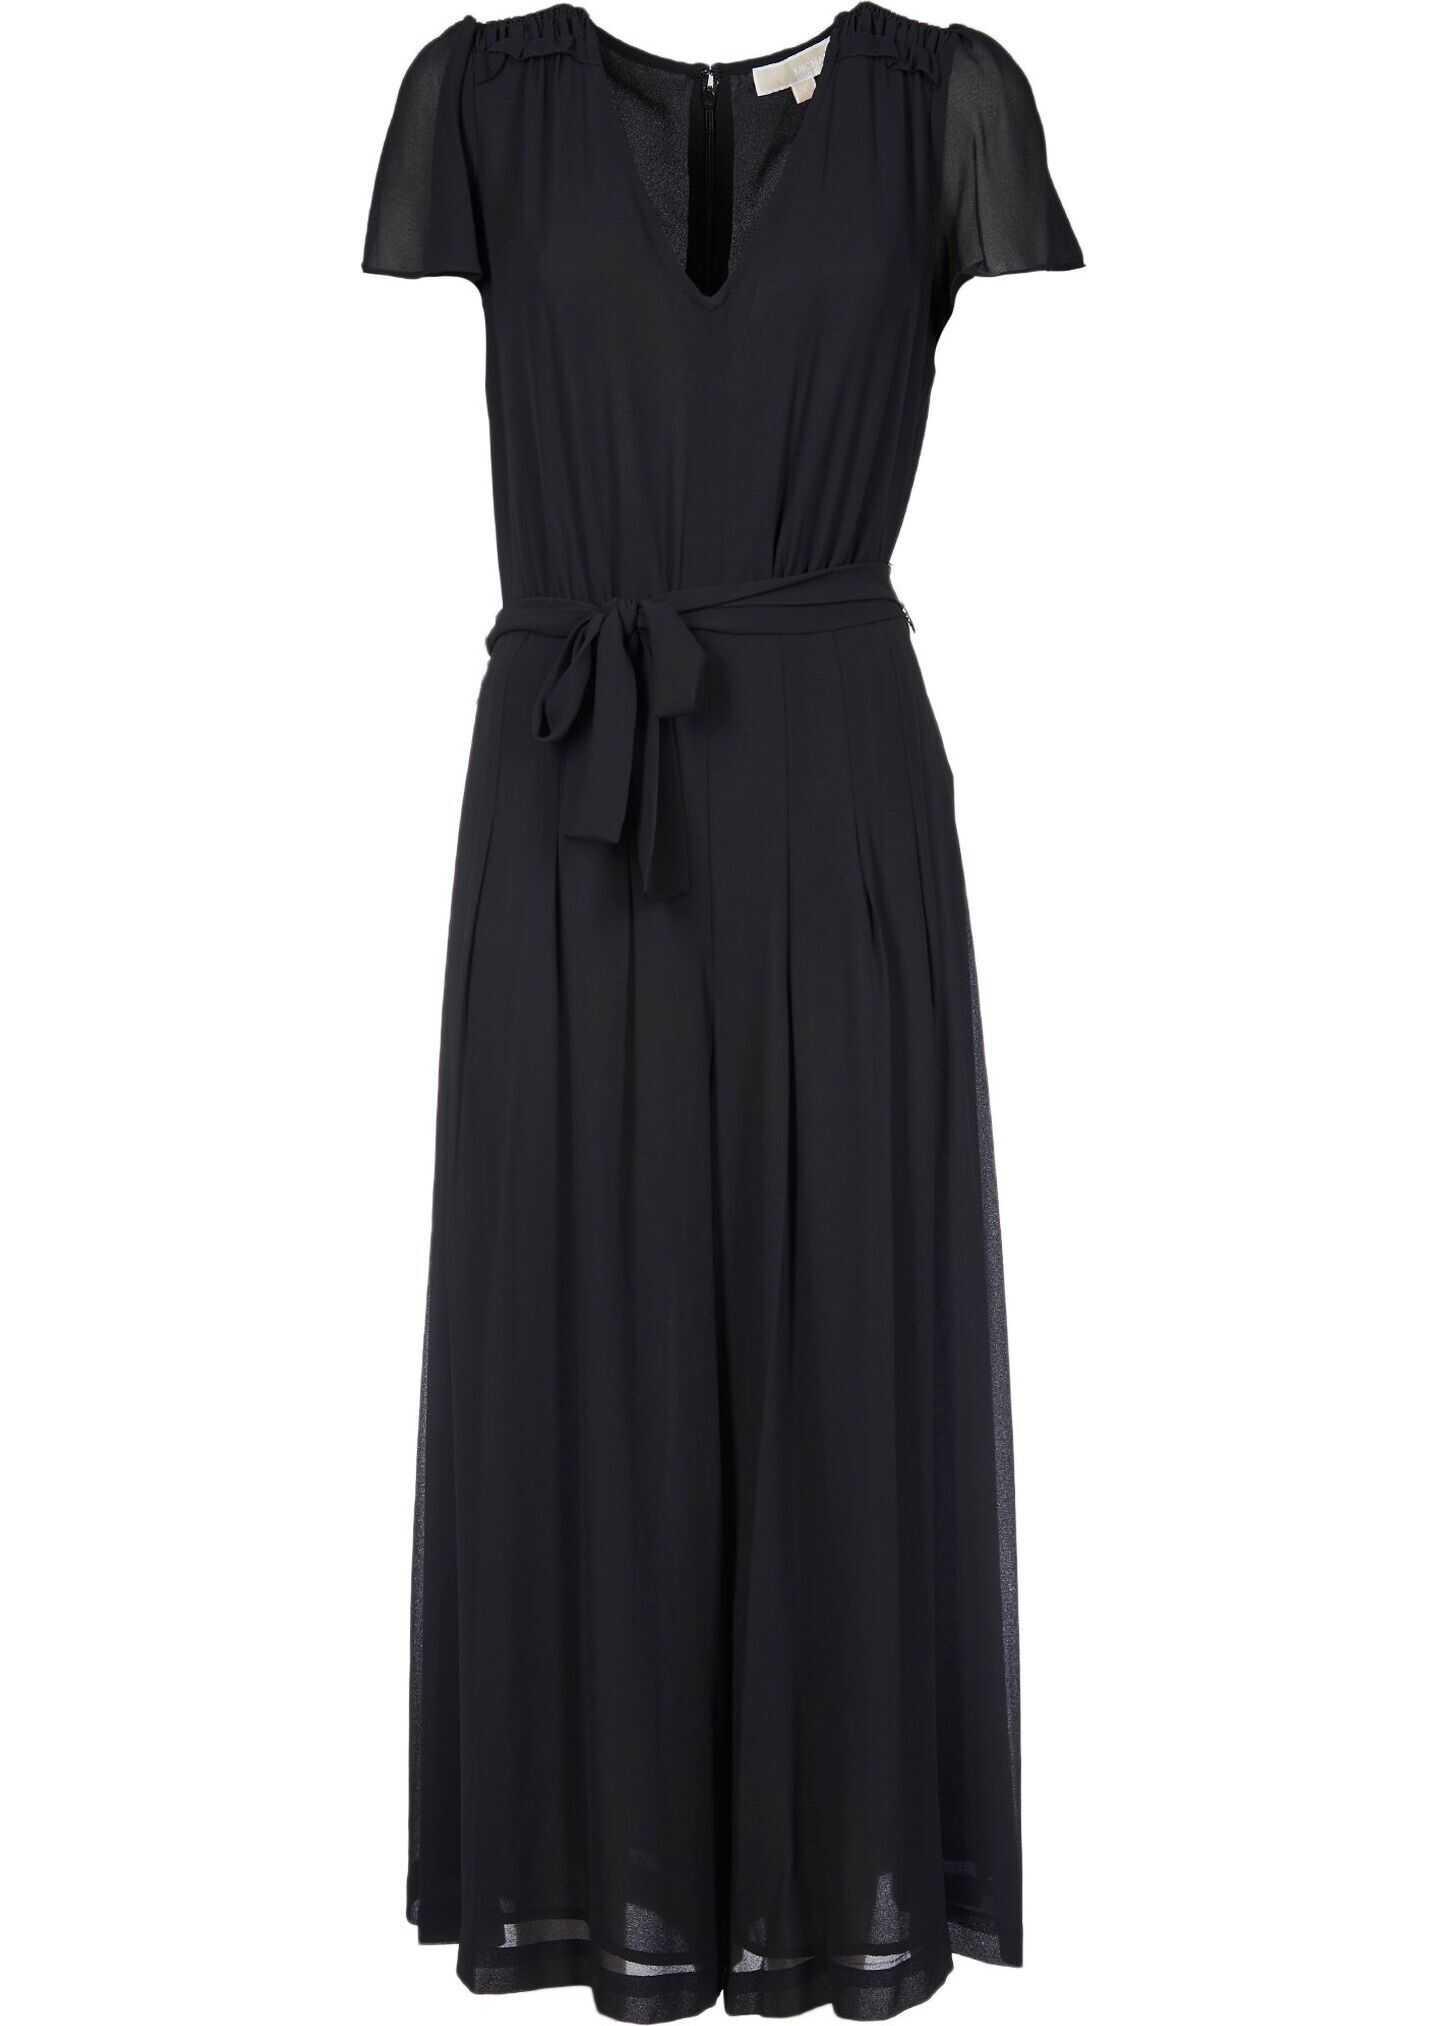 Michael Kors Polyester Dress BLACK